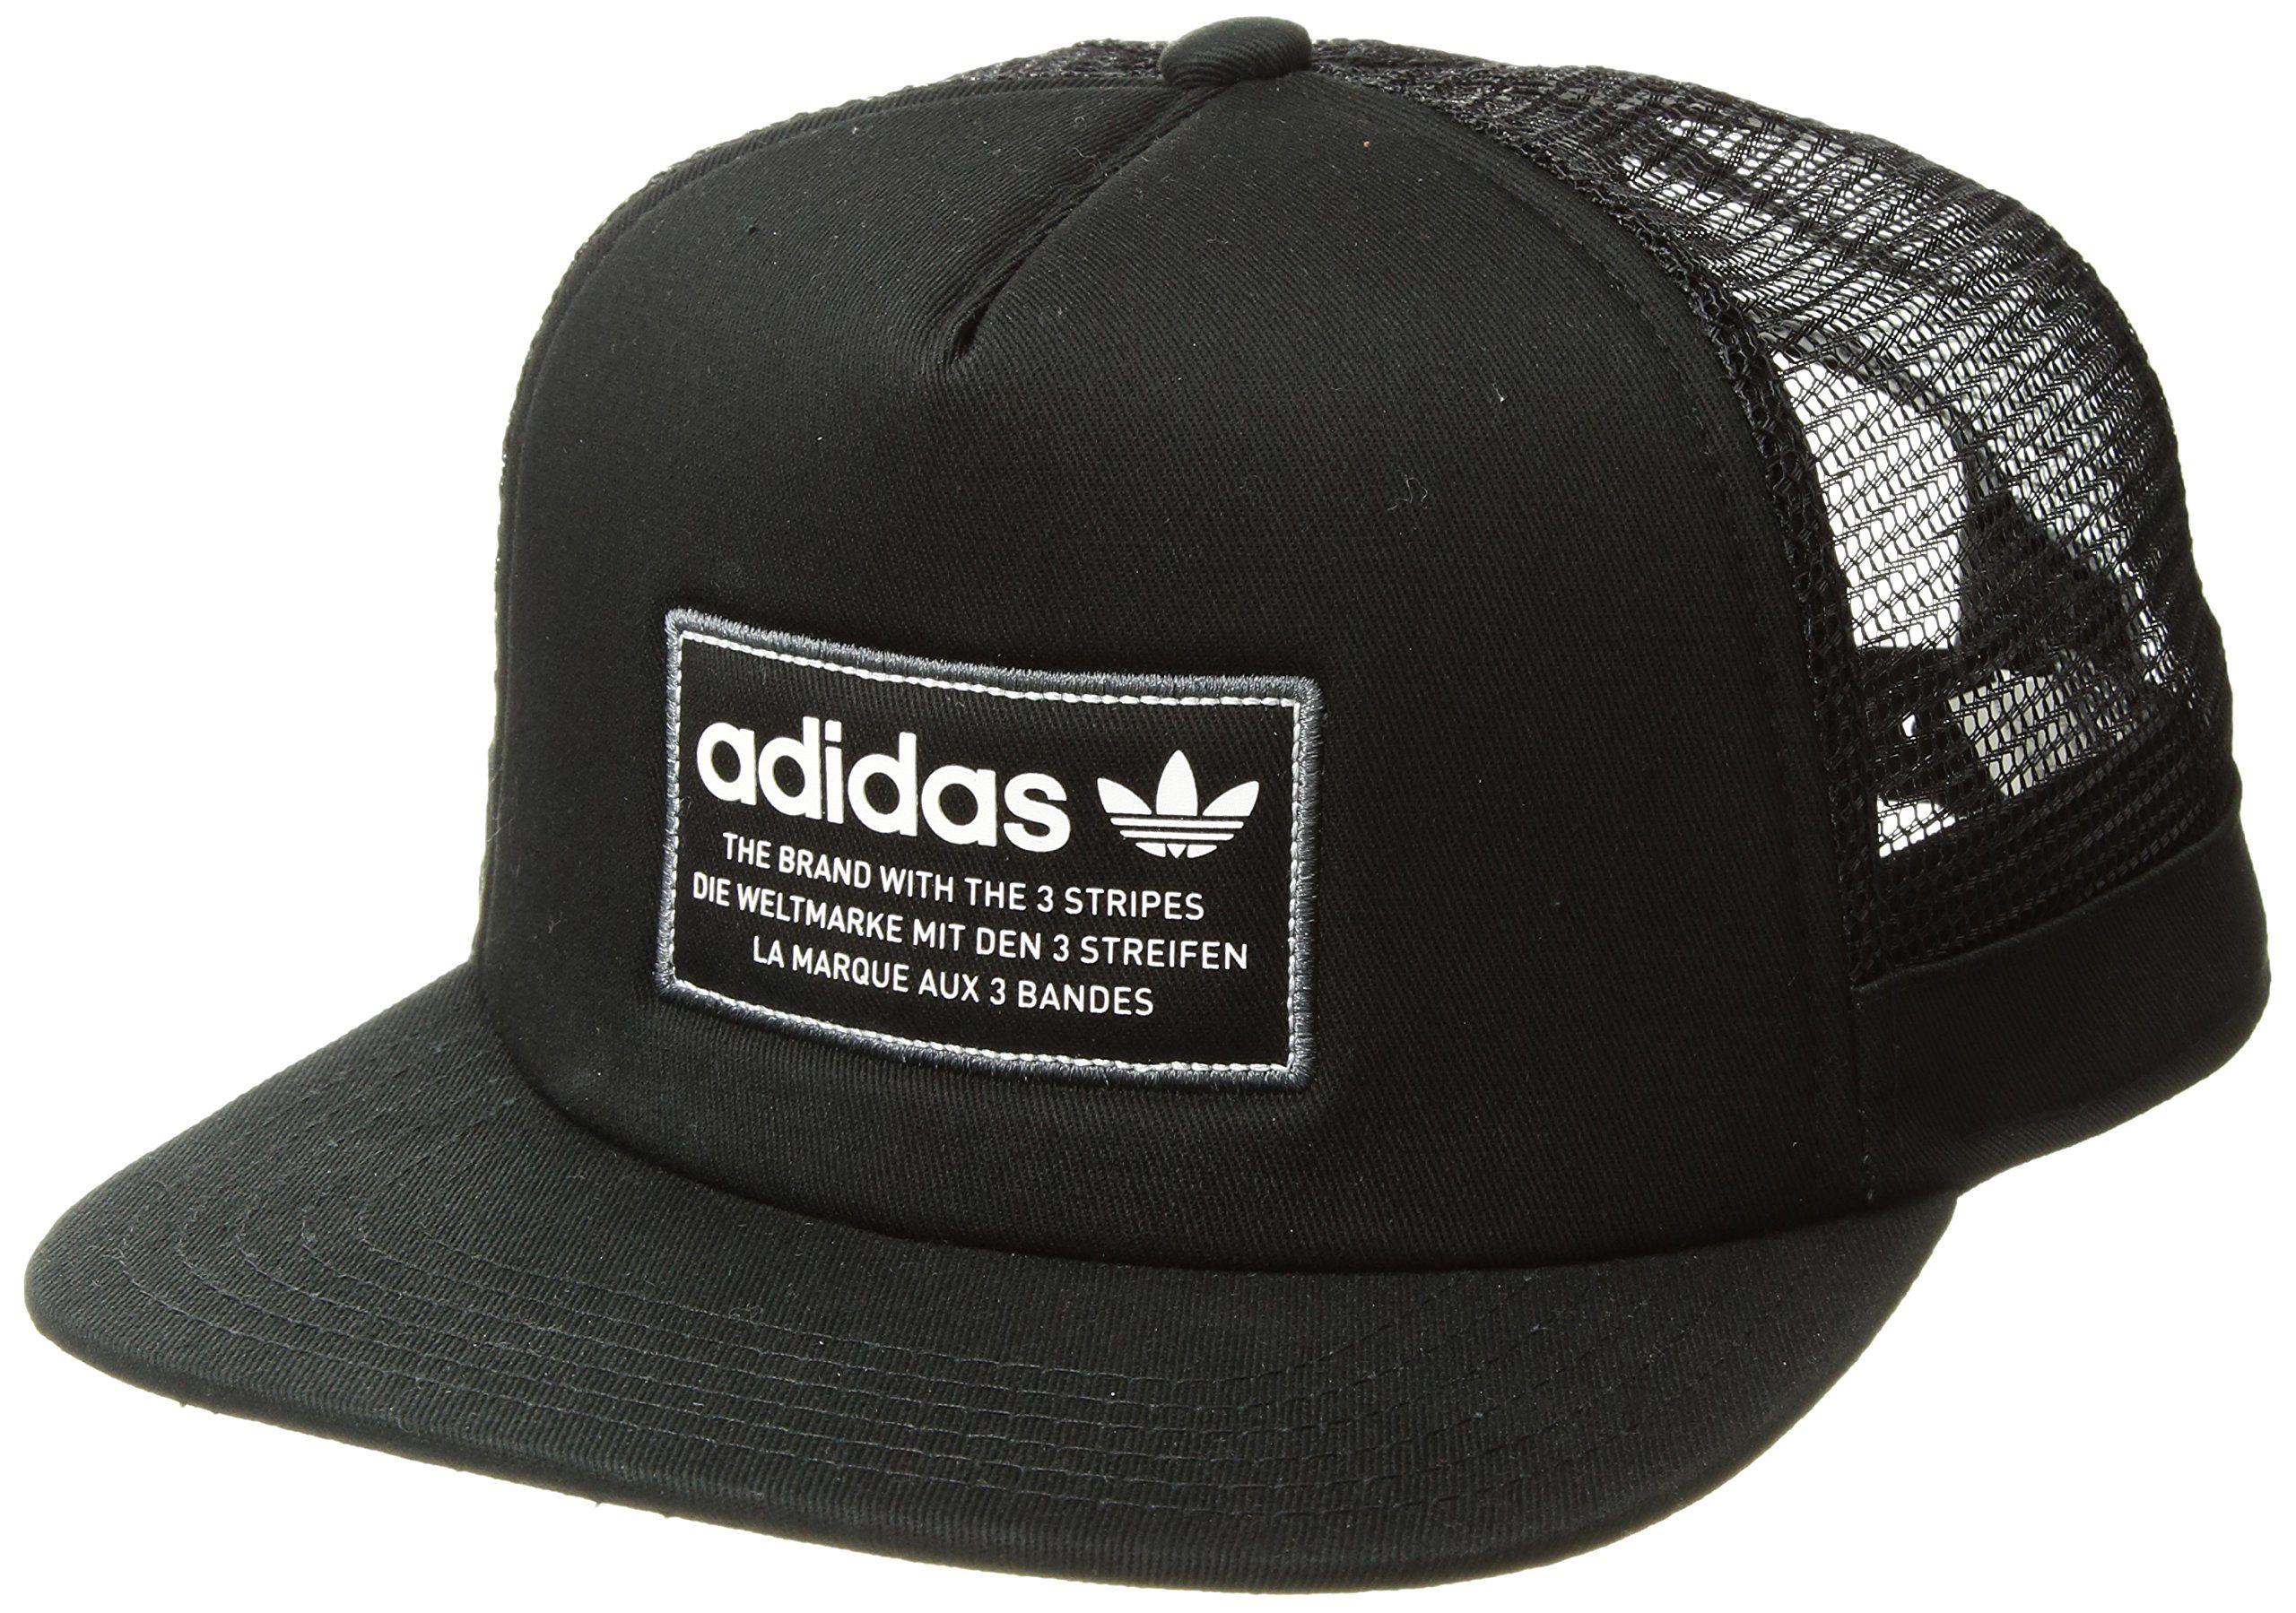 adidas Mens Originals Patch Trucker Structured Cap Black